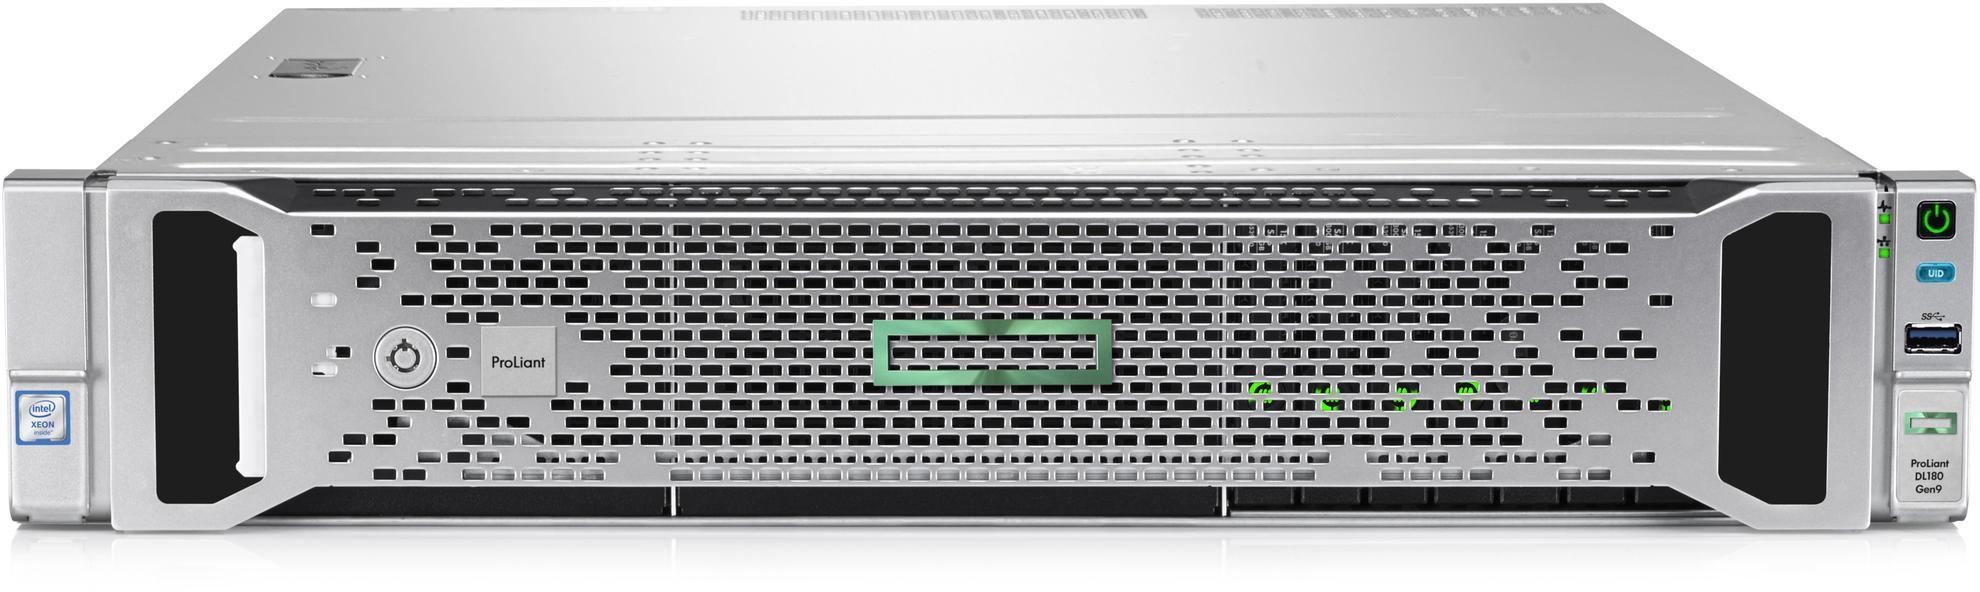 P9J04A Сервер Proliant DL180 Gen9 E5-2620v3 Hot Plug Rack(2U)/Xeon6C